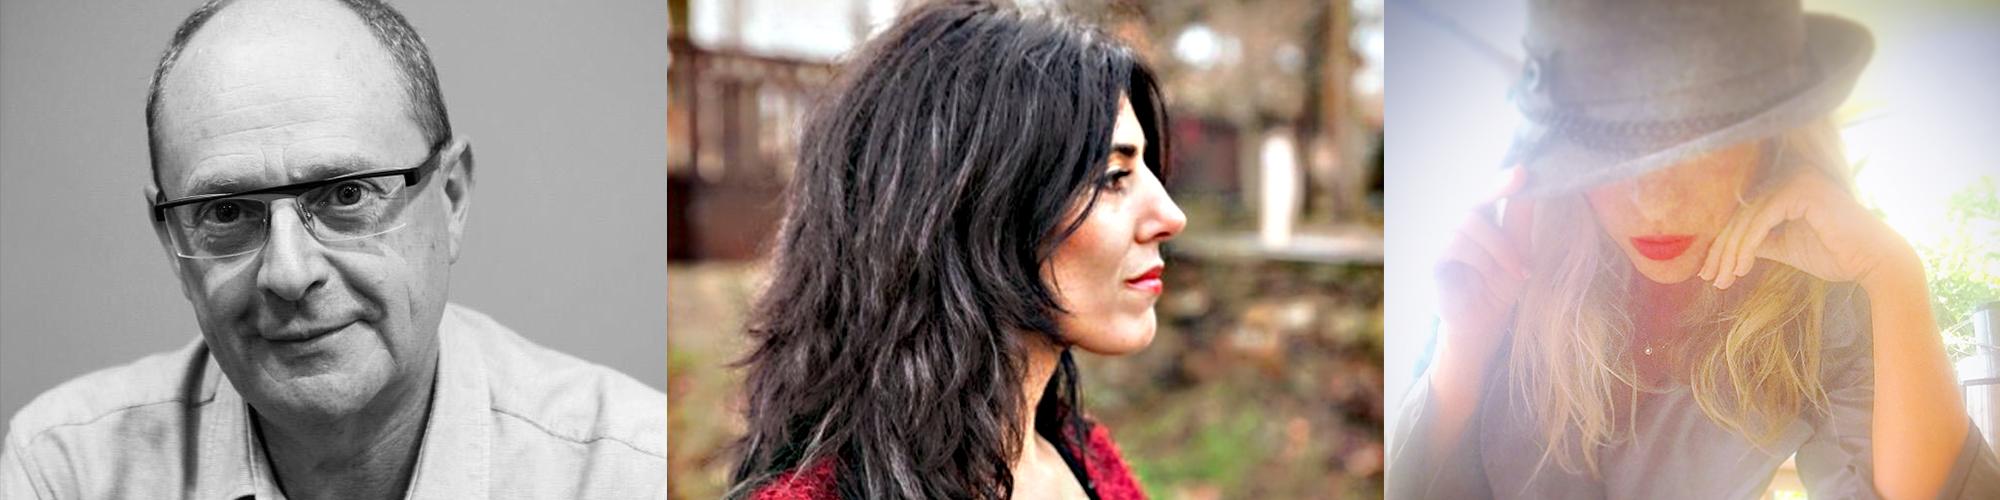 Pisando uvas con Marta Robles - EL PAIS Viajes